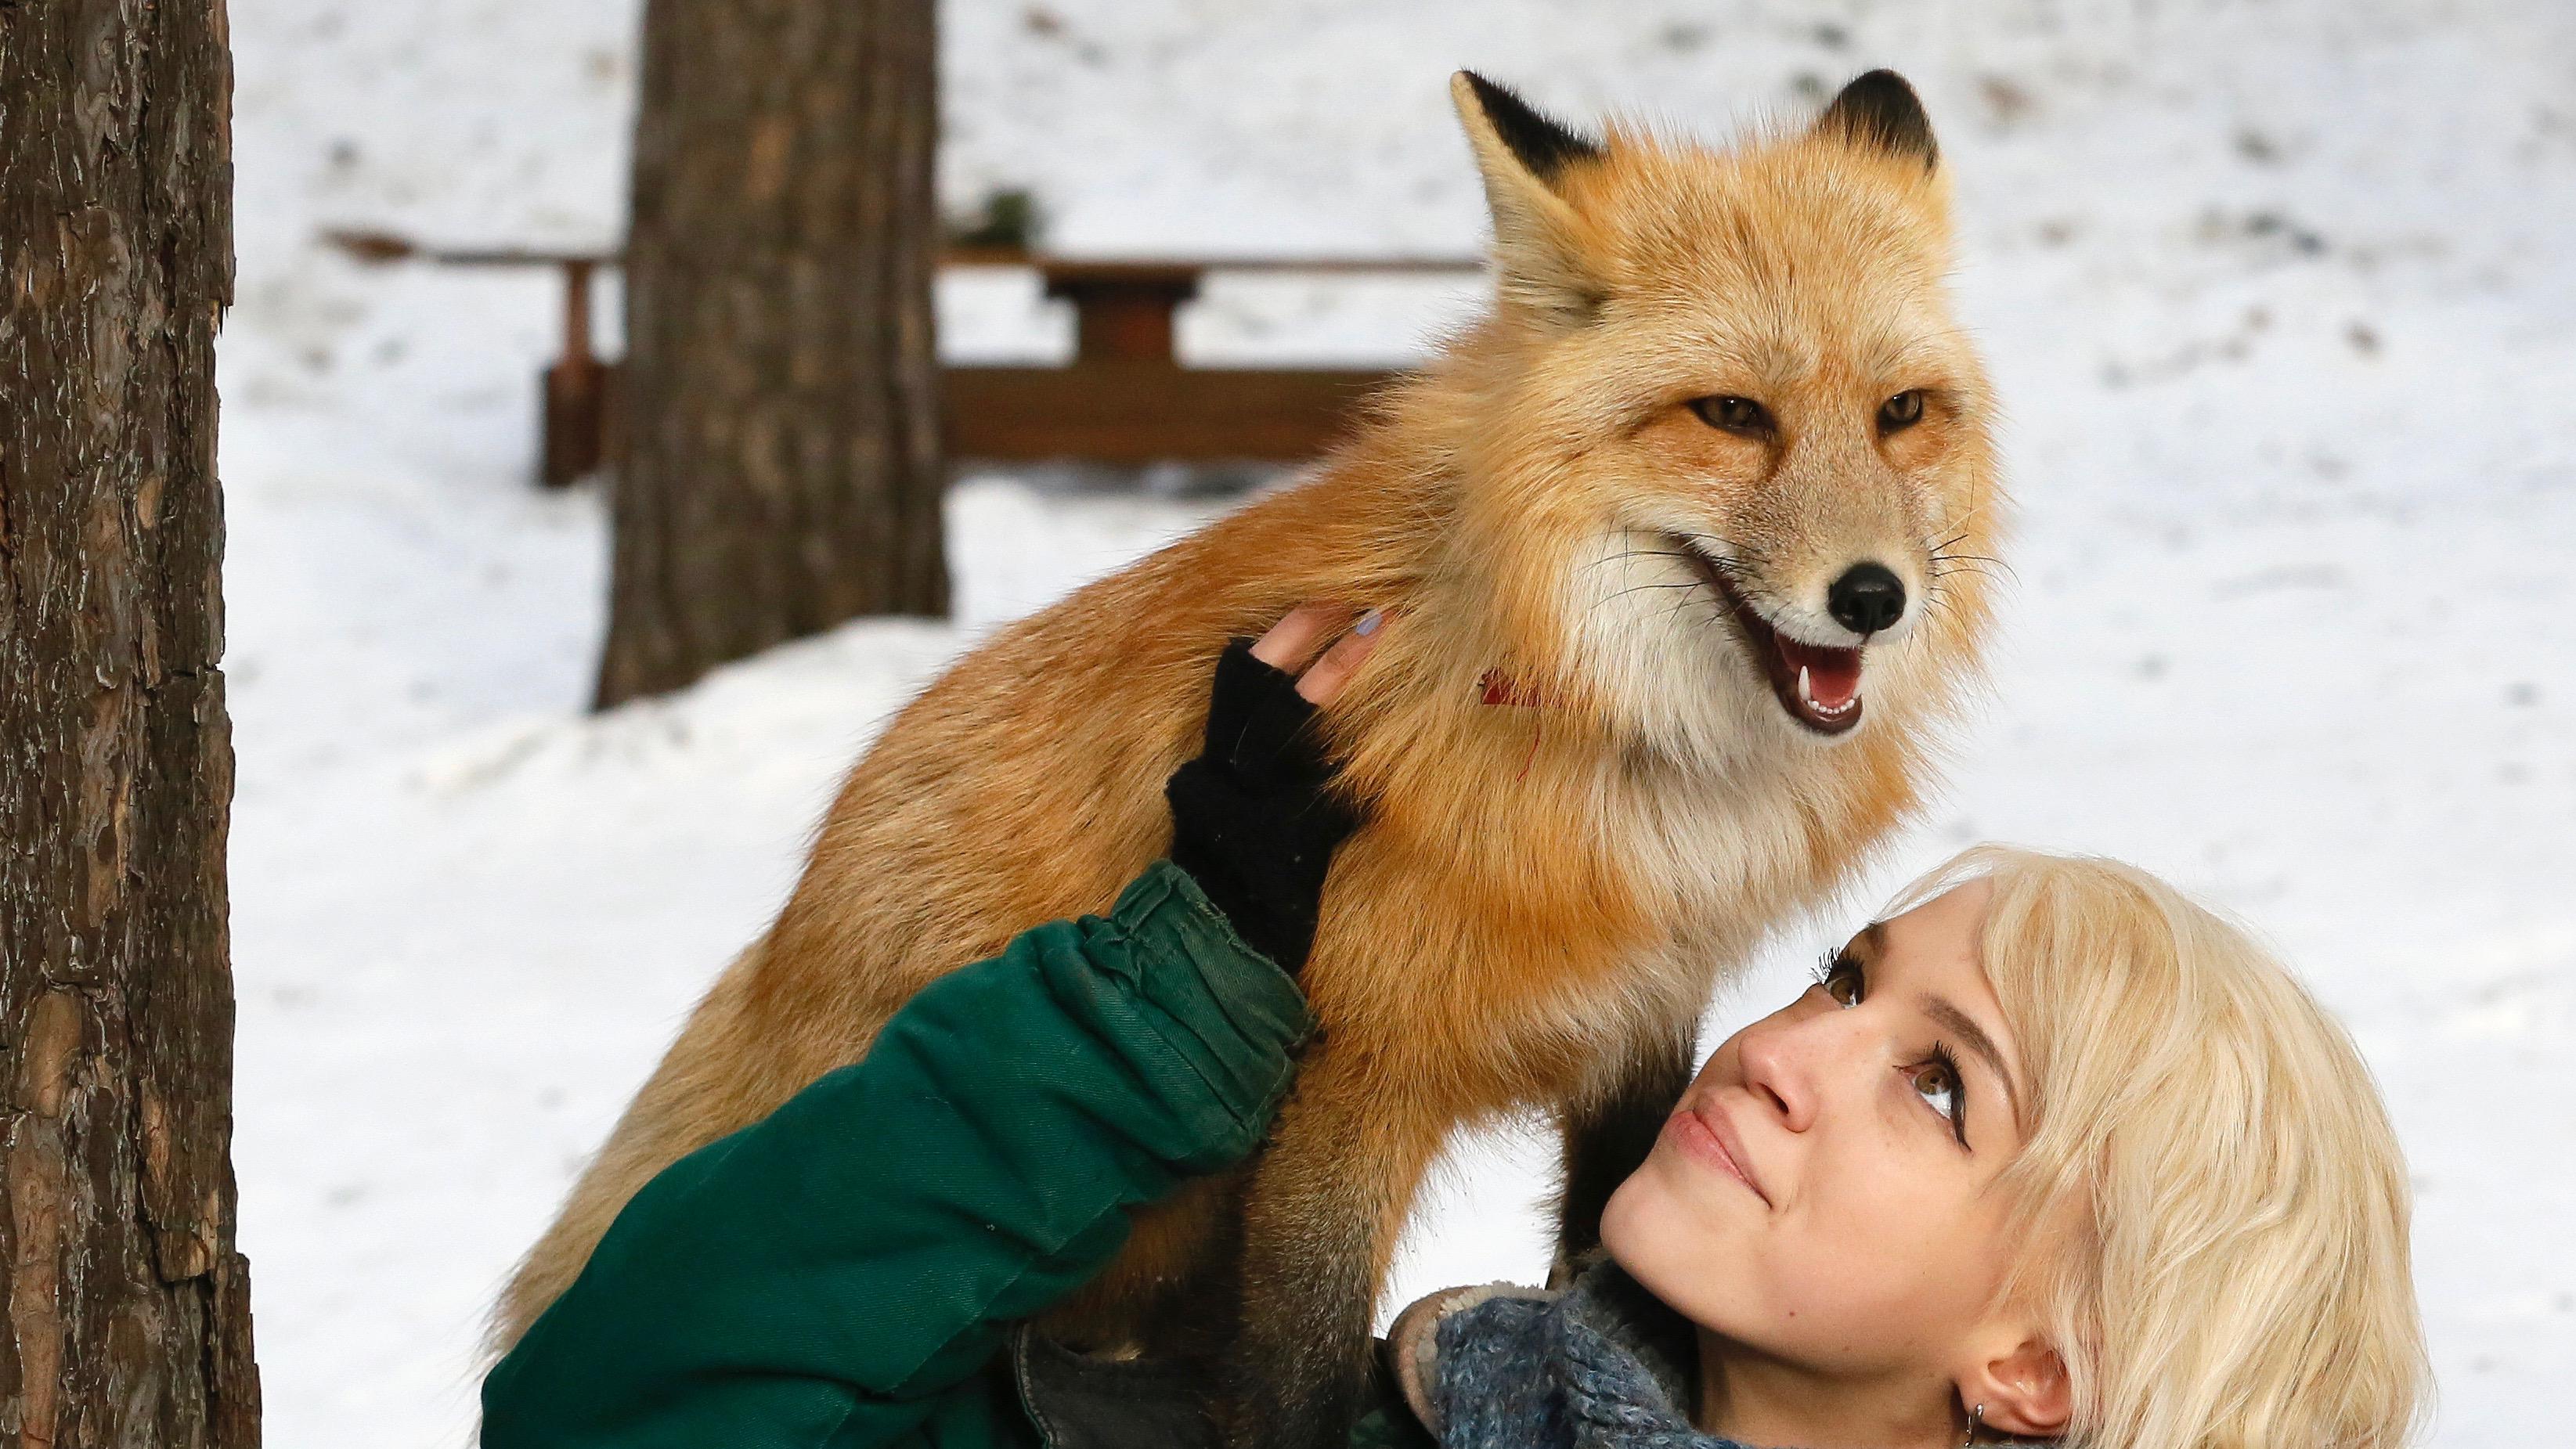 How To Tame A Fox According To Science Quartz